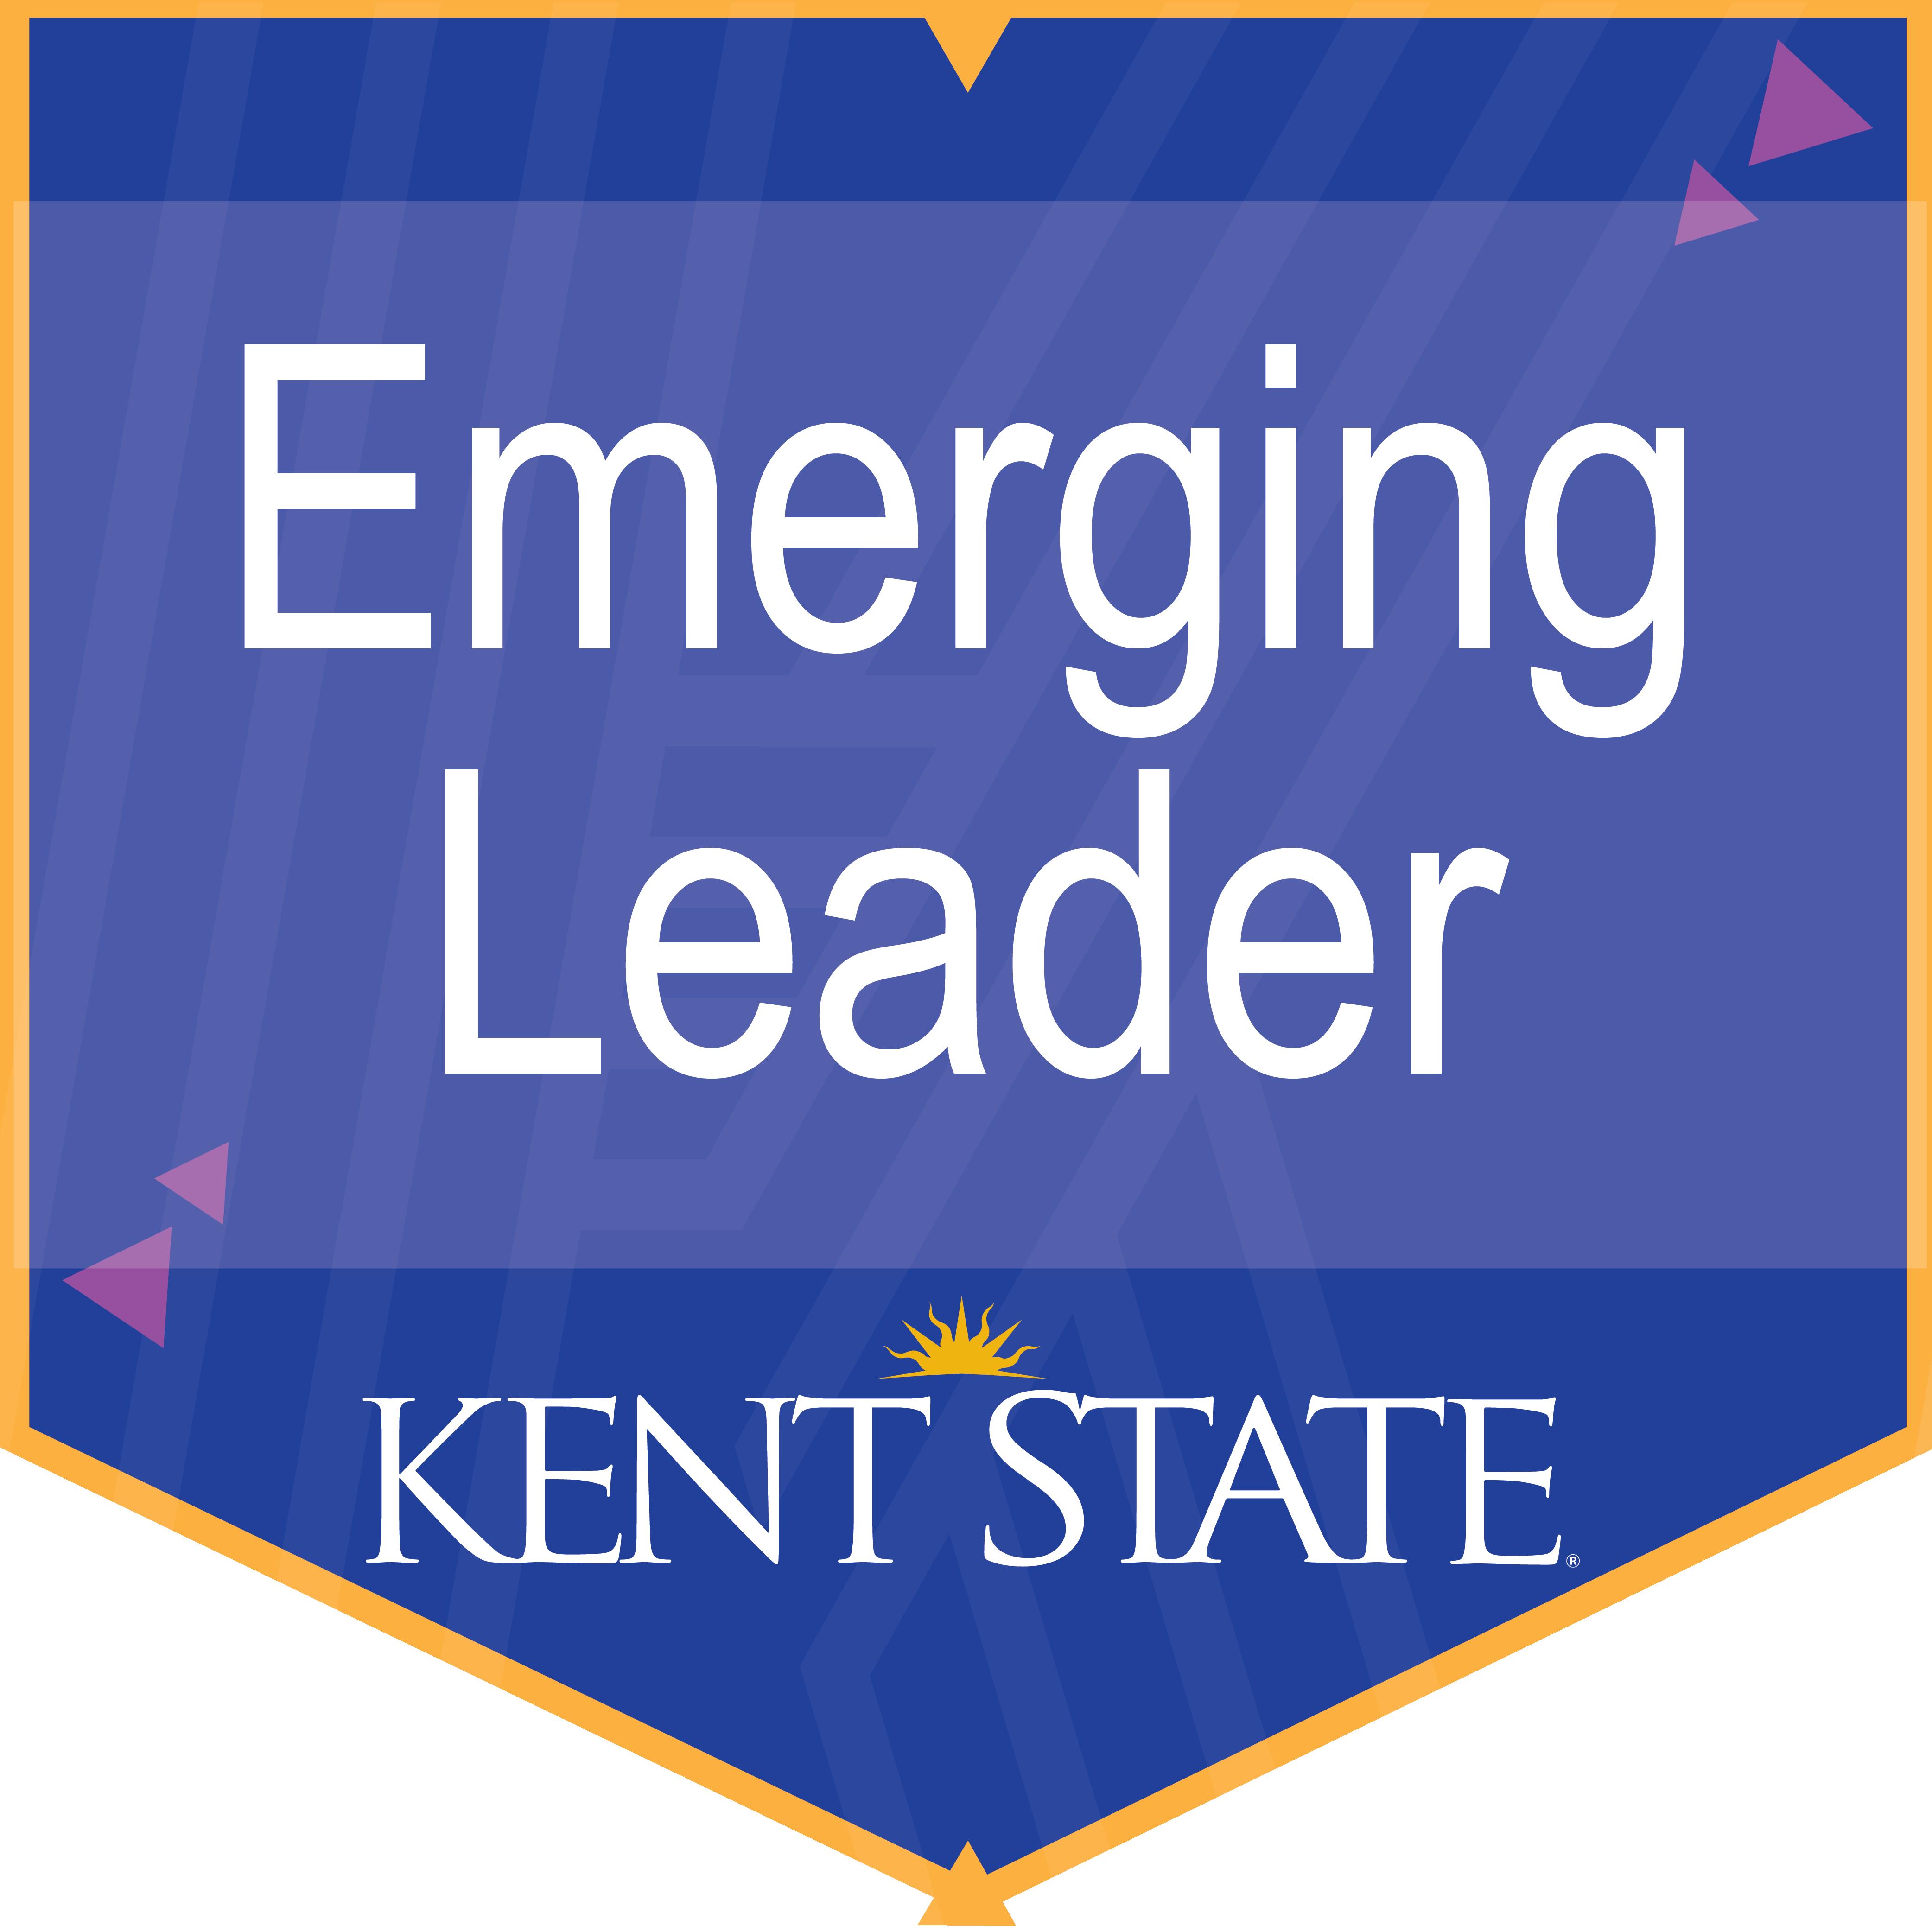 Certificate for Emerging Leaders Digital Badge